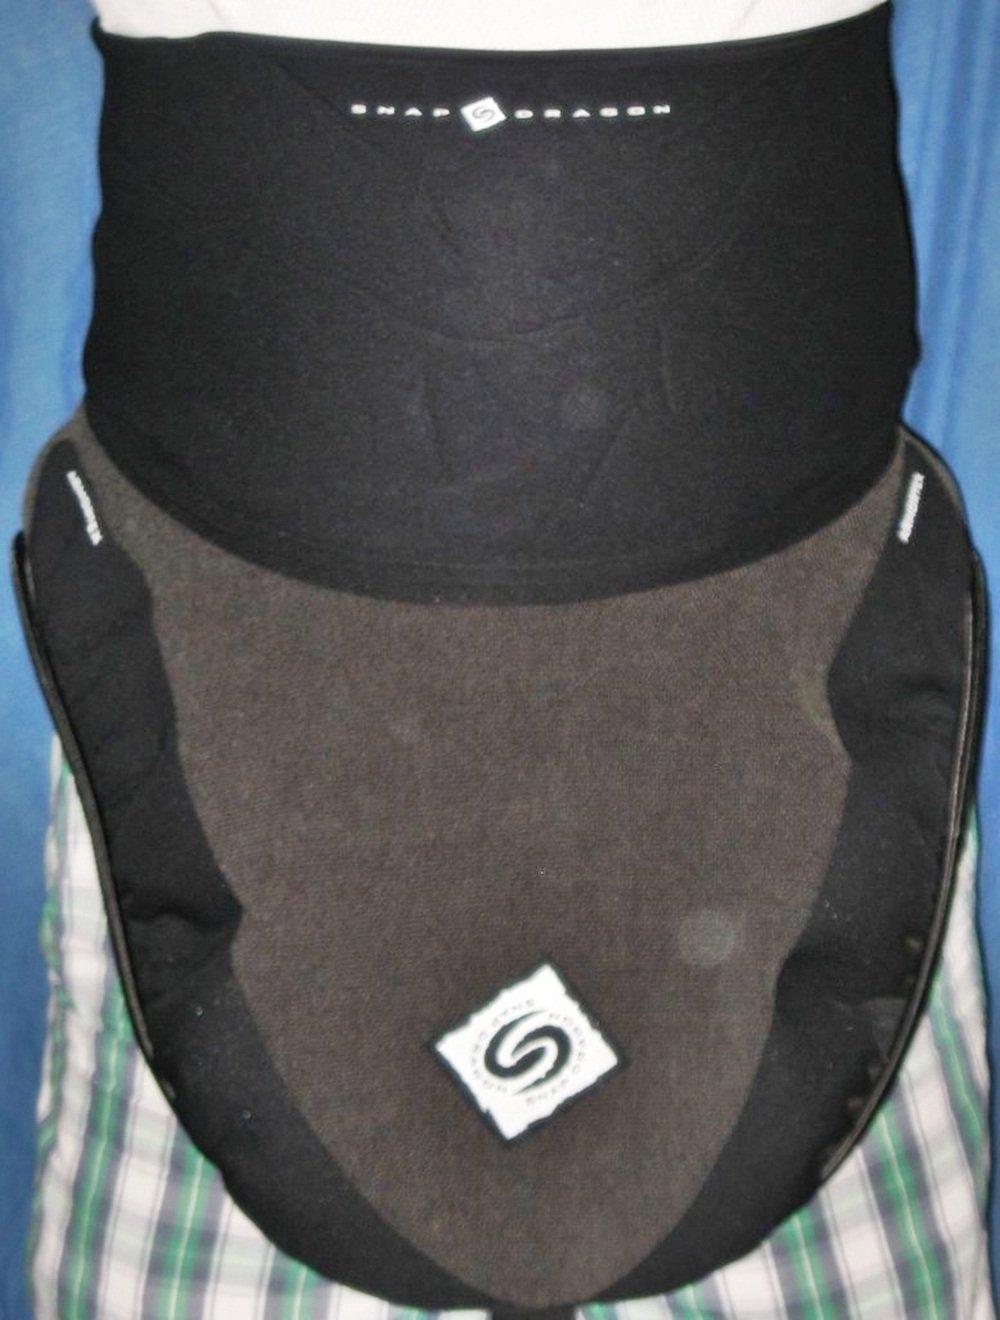 Kayak Spray Skirt White Water Snap Dragon Canoe Kayak Accessories Spray Skirt Armortex